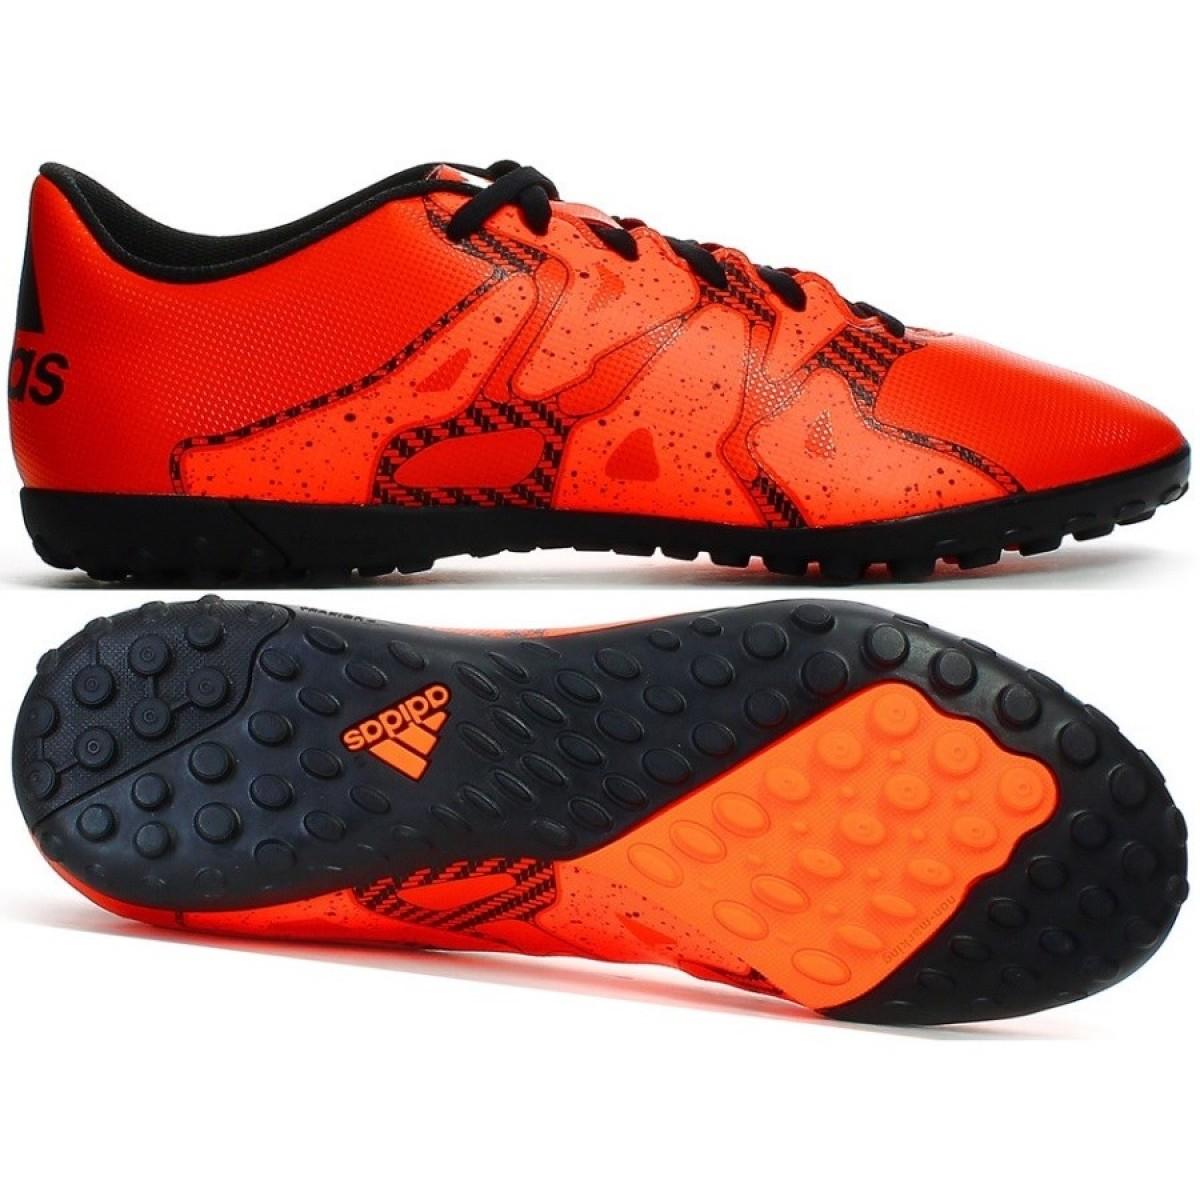 f6099c8ed1 Chuteira Society Adidas X 15 4 TF Laranja - Compre Agora